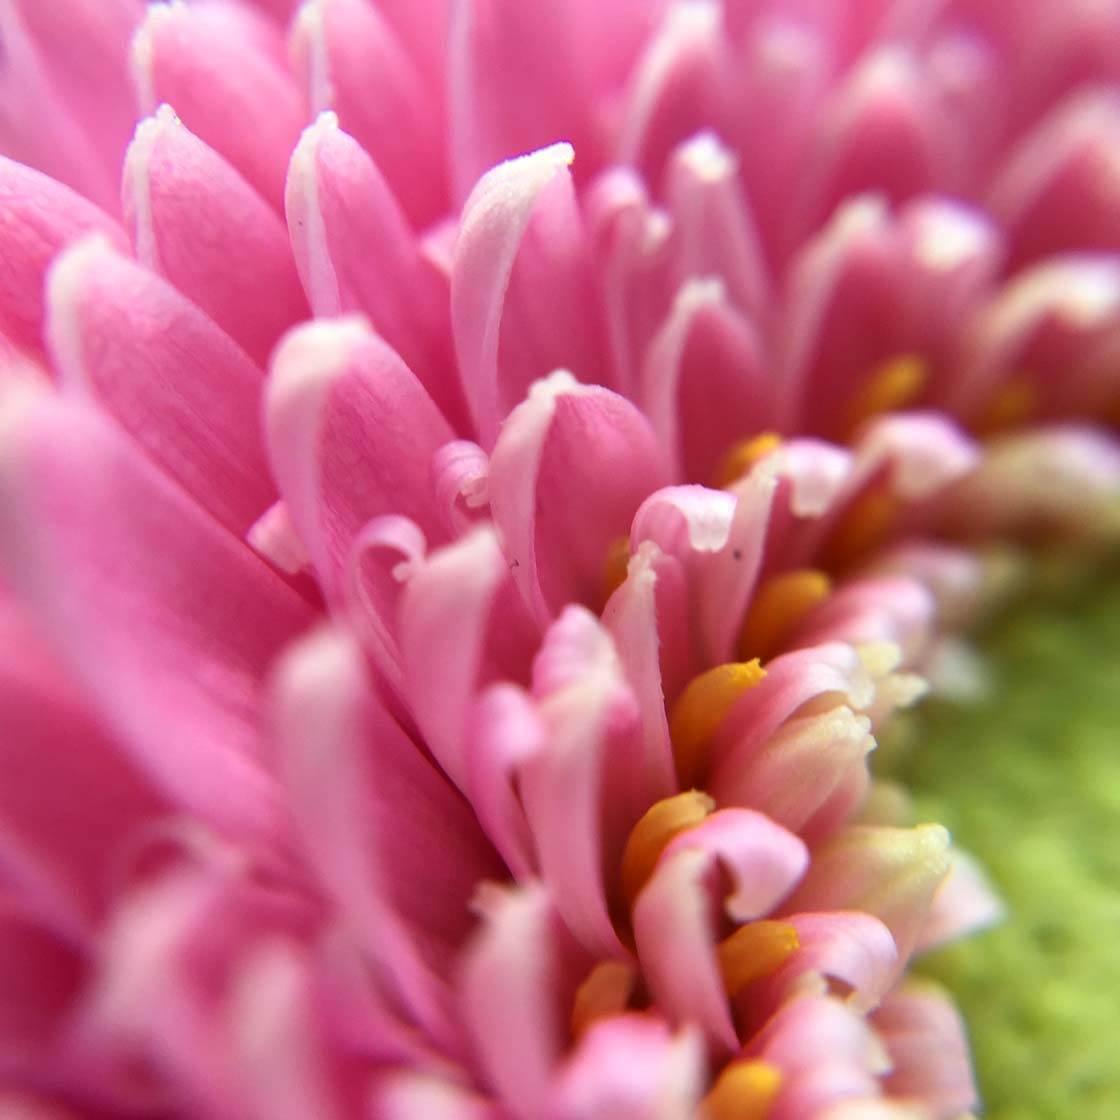 iPhone Flower Photography 16 no script